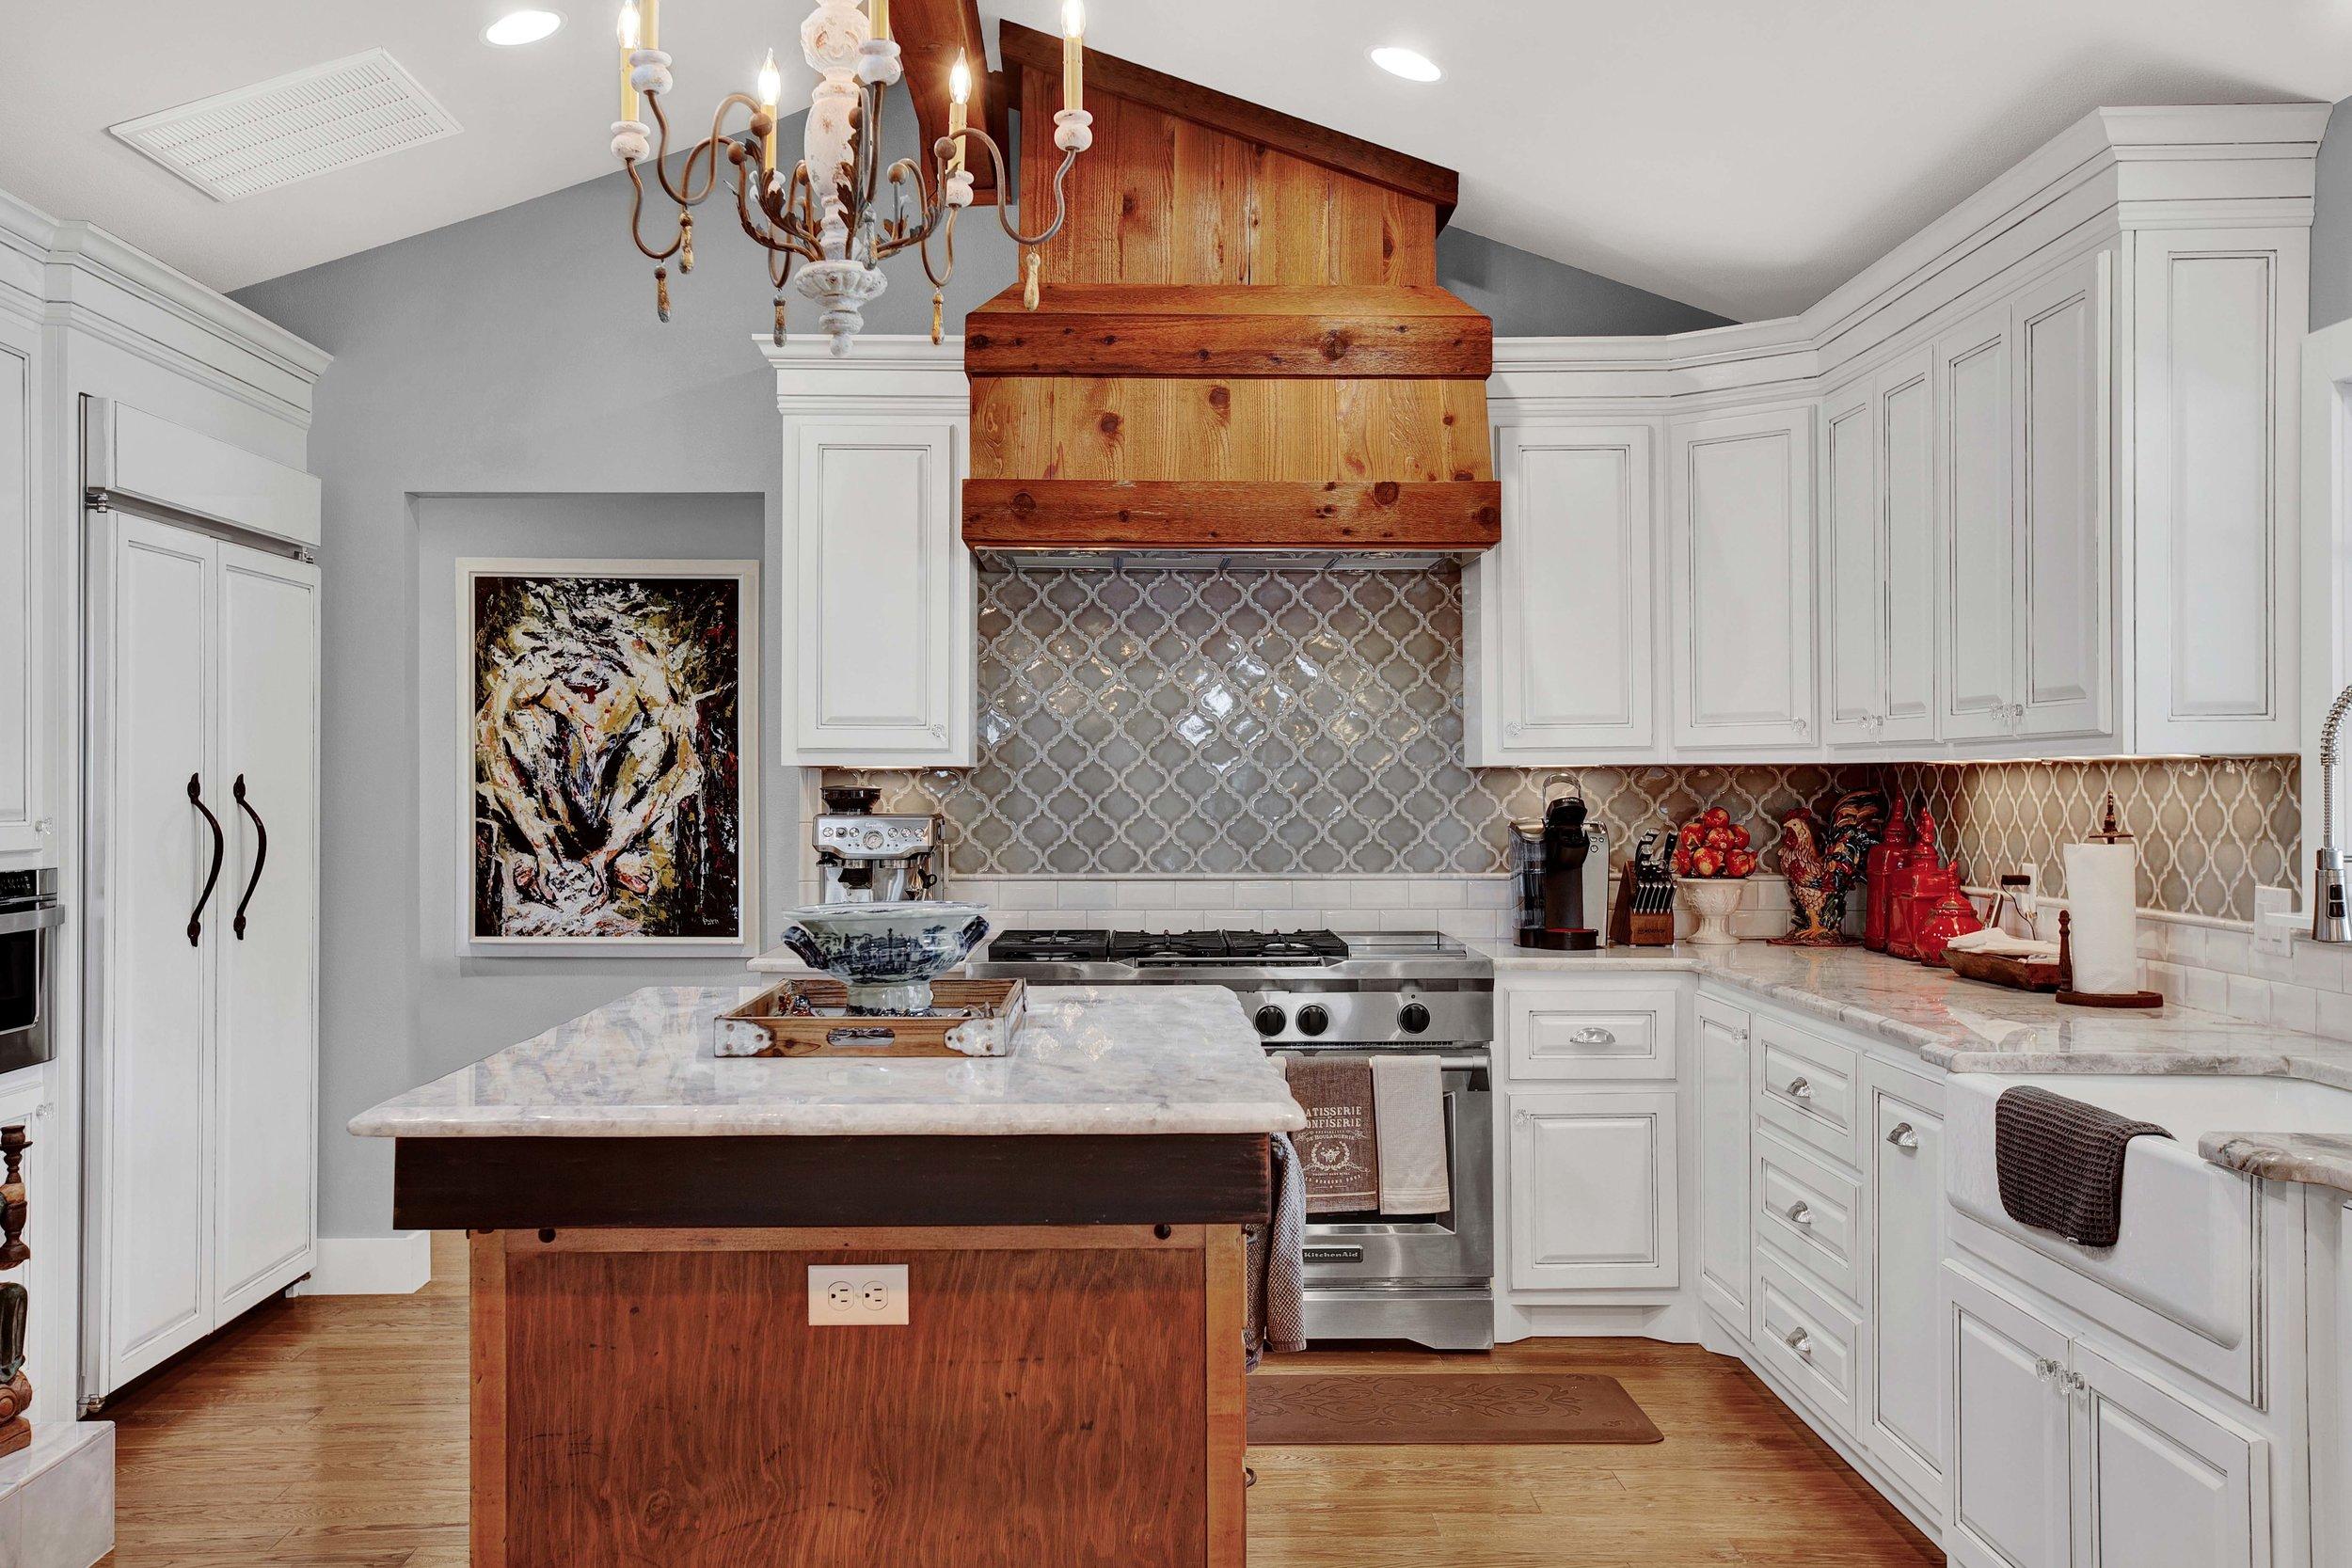 fredericksburg-realty-fredericksburg-texas-realestate-luxury-home-kitchen.jpg